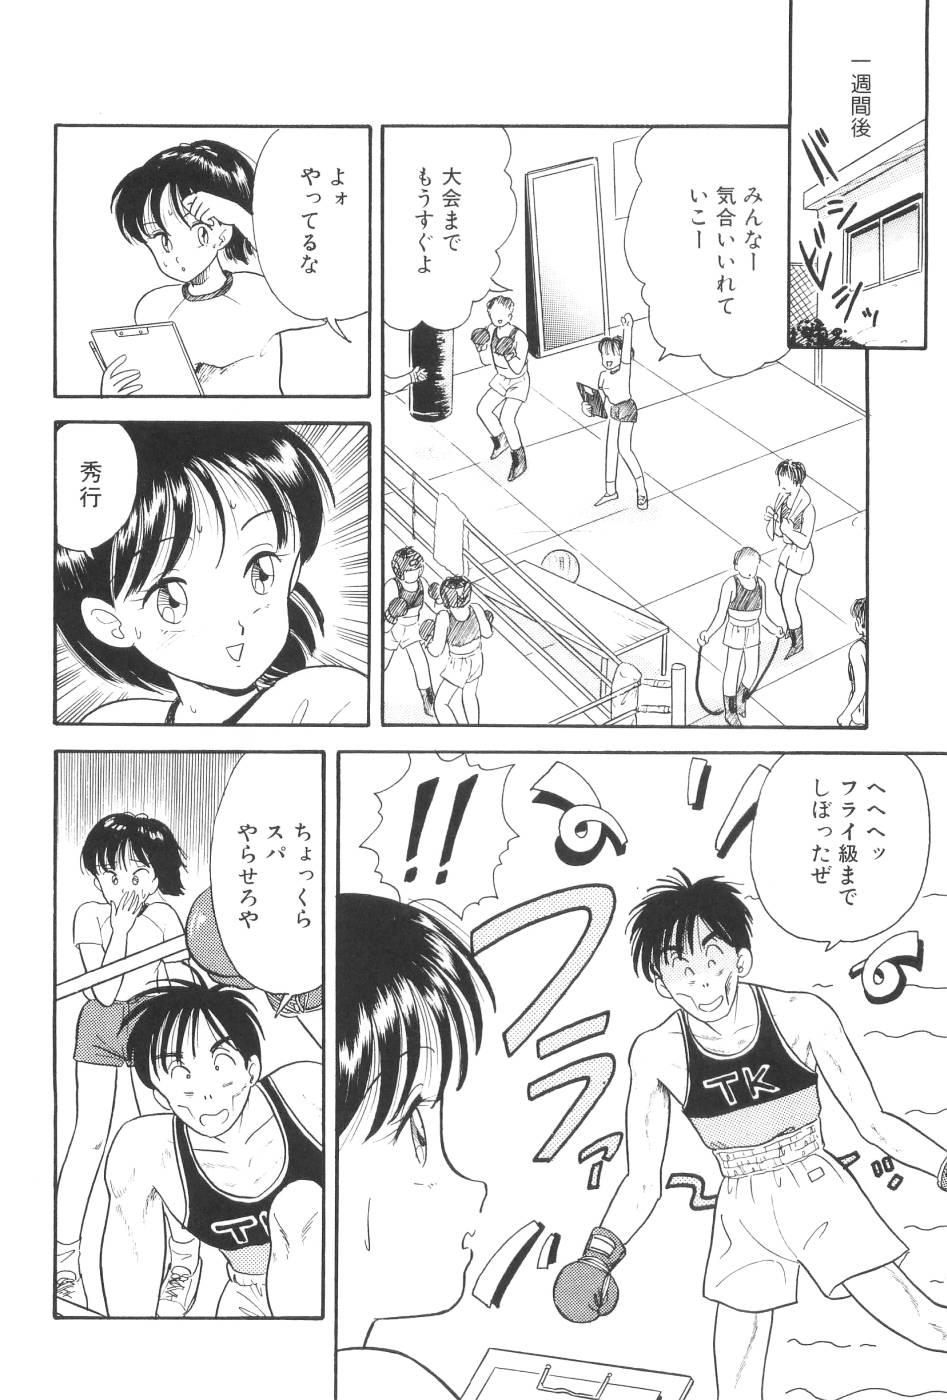 Namioto Densetsu 165